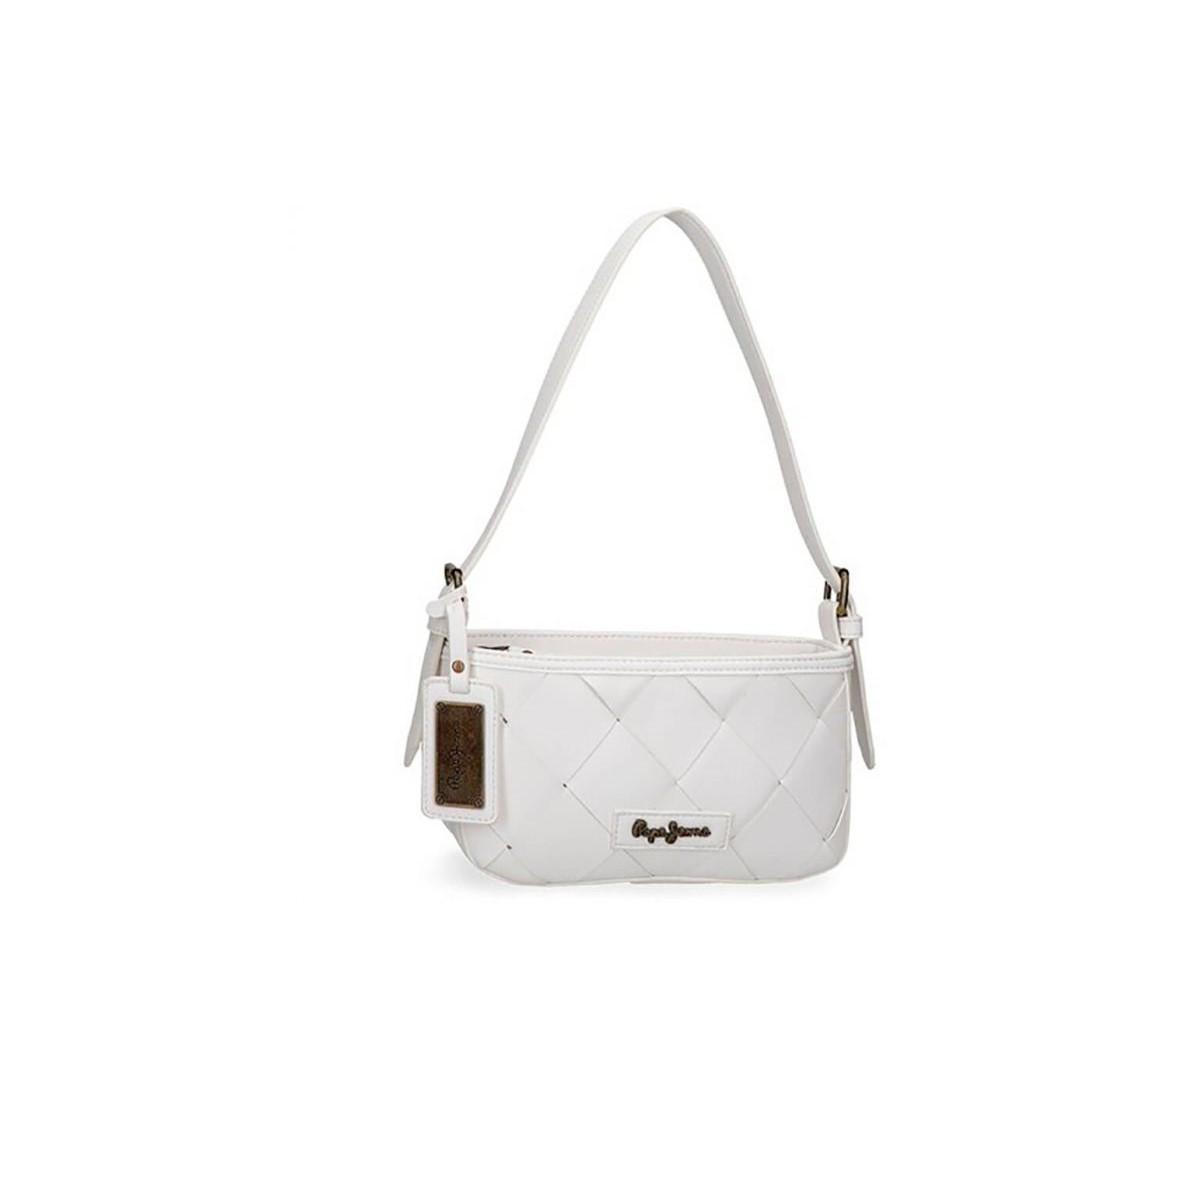 Pepe Jeans dámská bílá kabelka CUTOUTS SHOULDER BAG